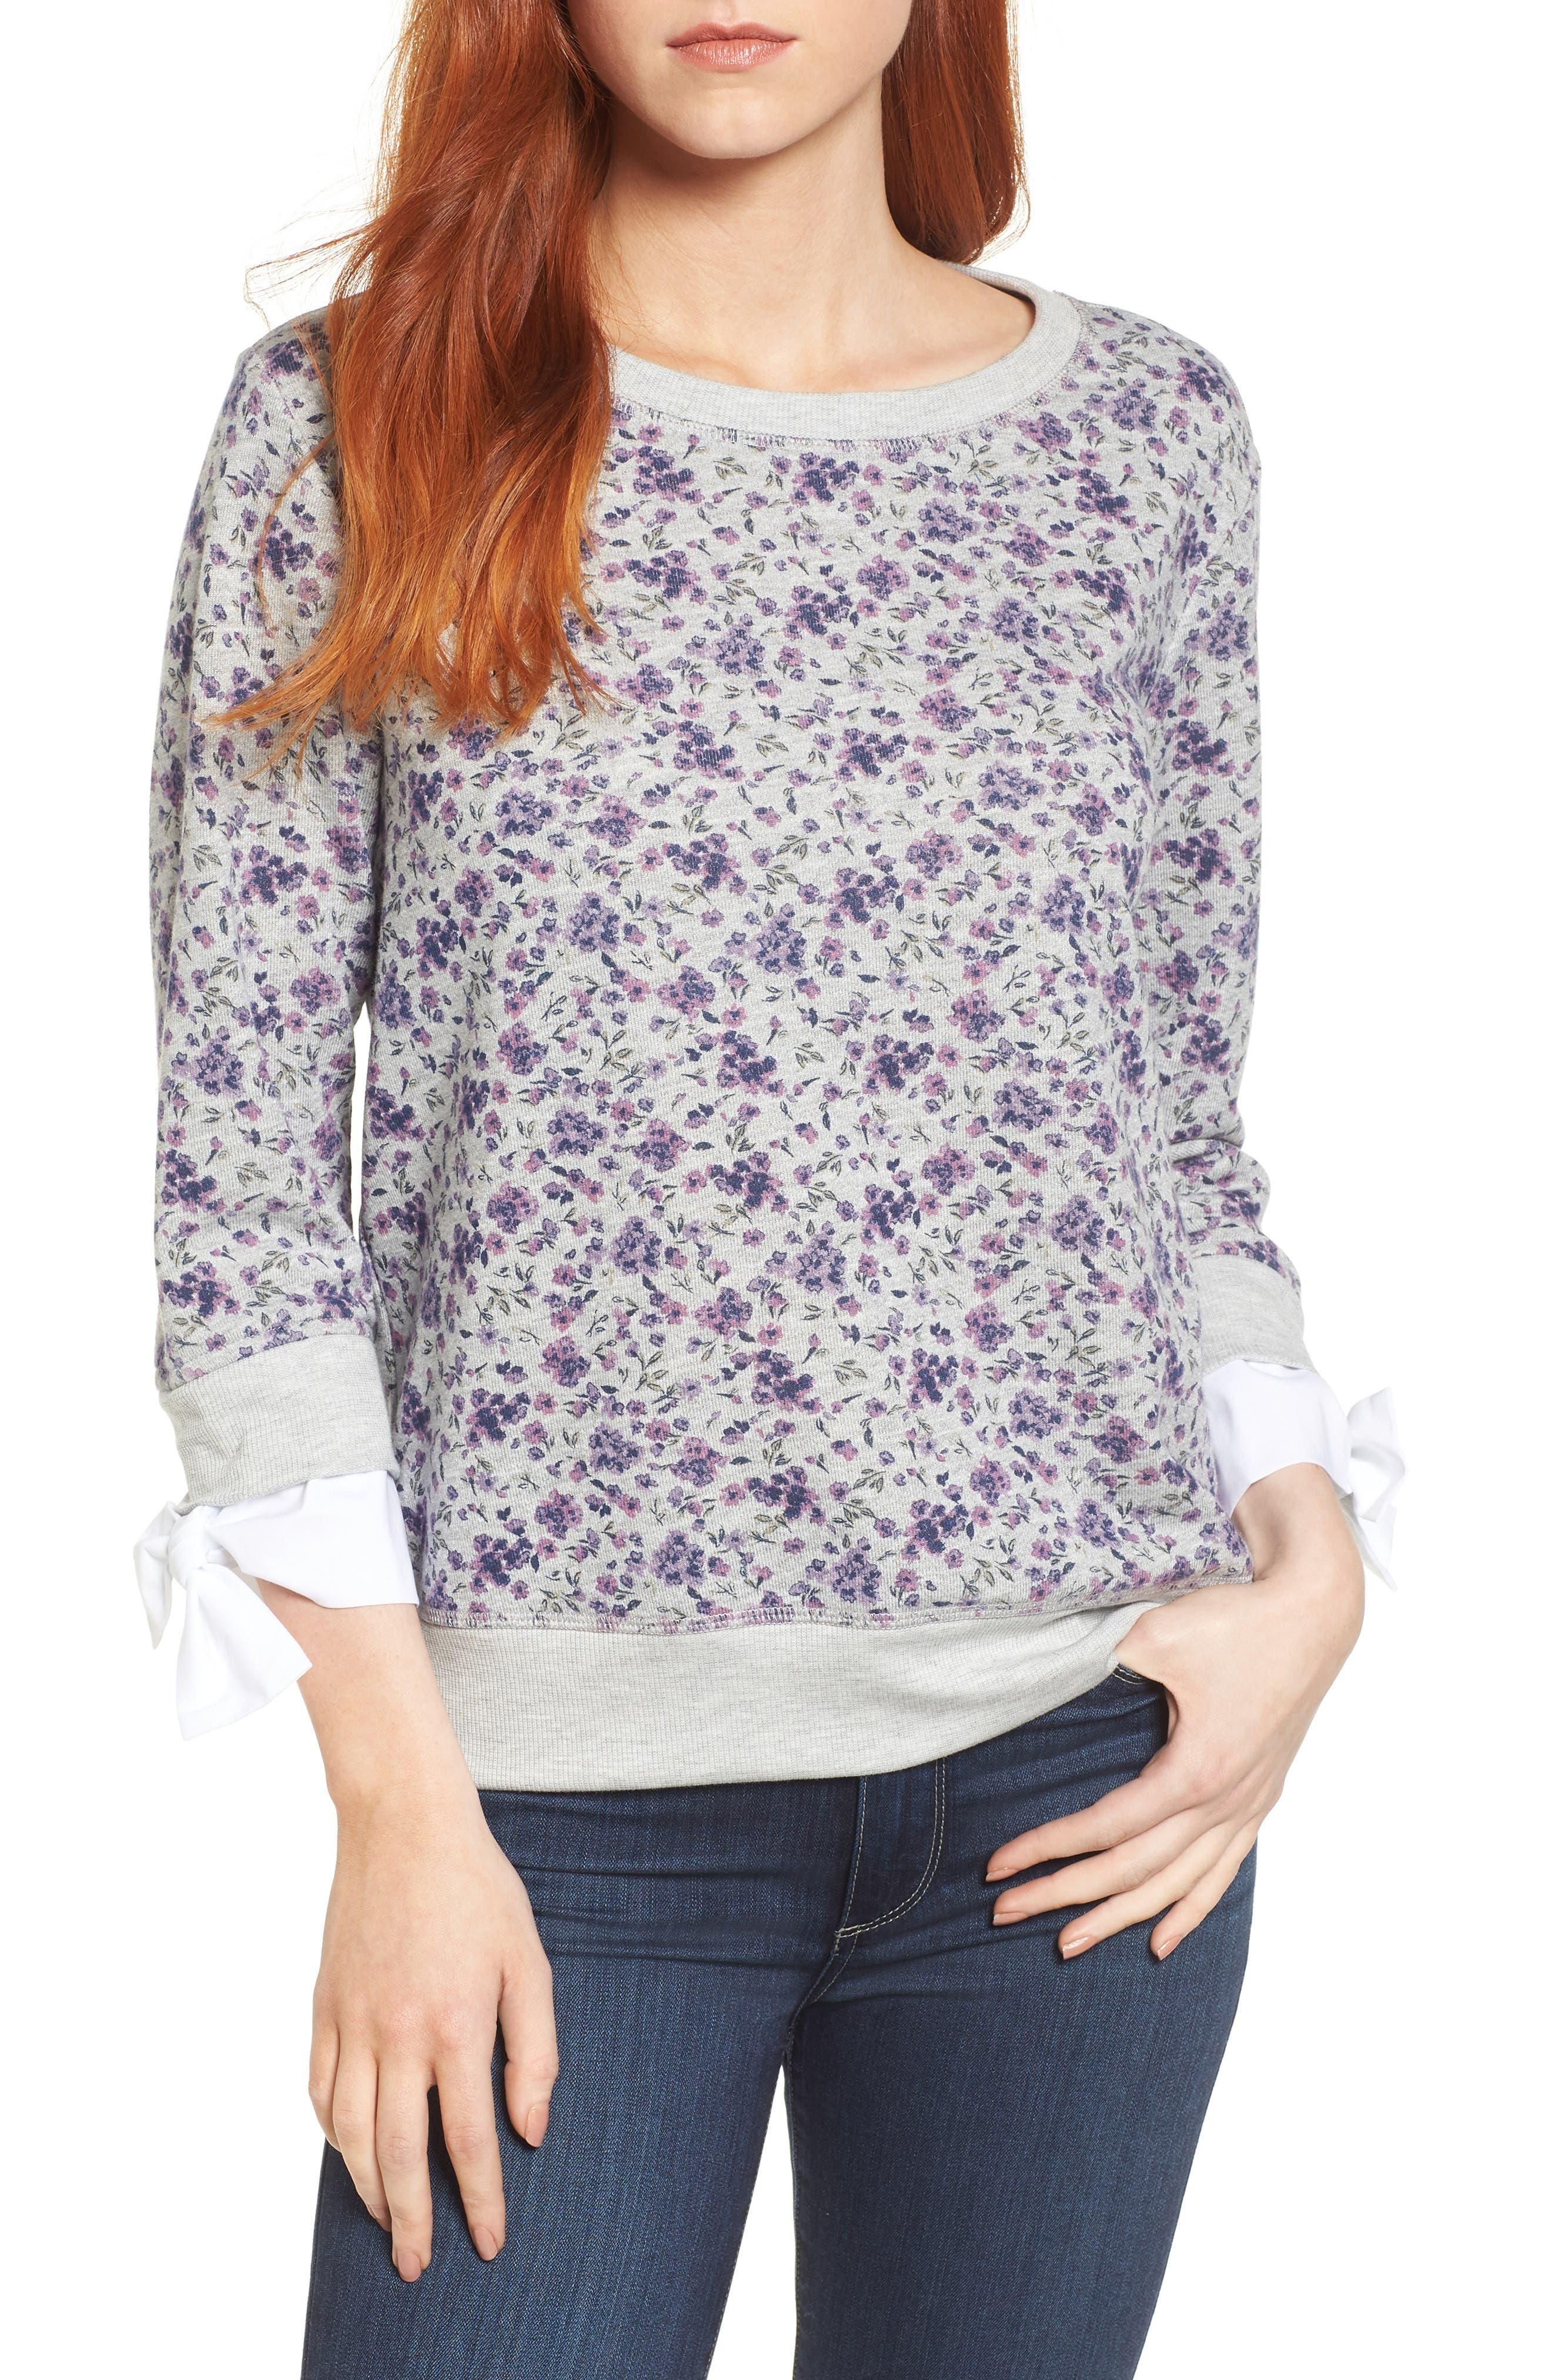 Poplin Cuff Sweatshirt,                         Main,                         color, GREY FLORAL W/ WHITE POPLIN